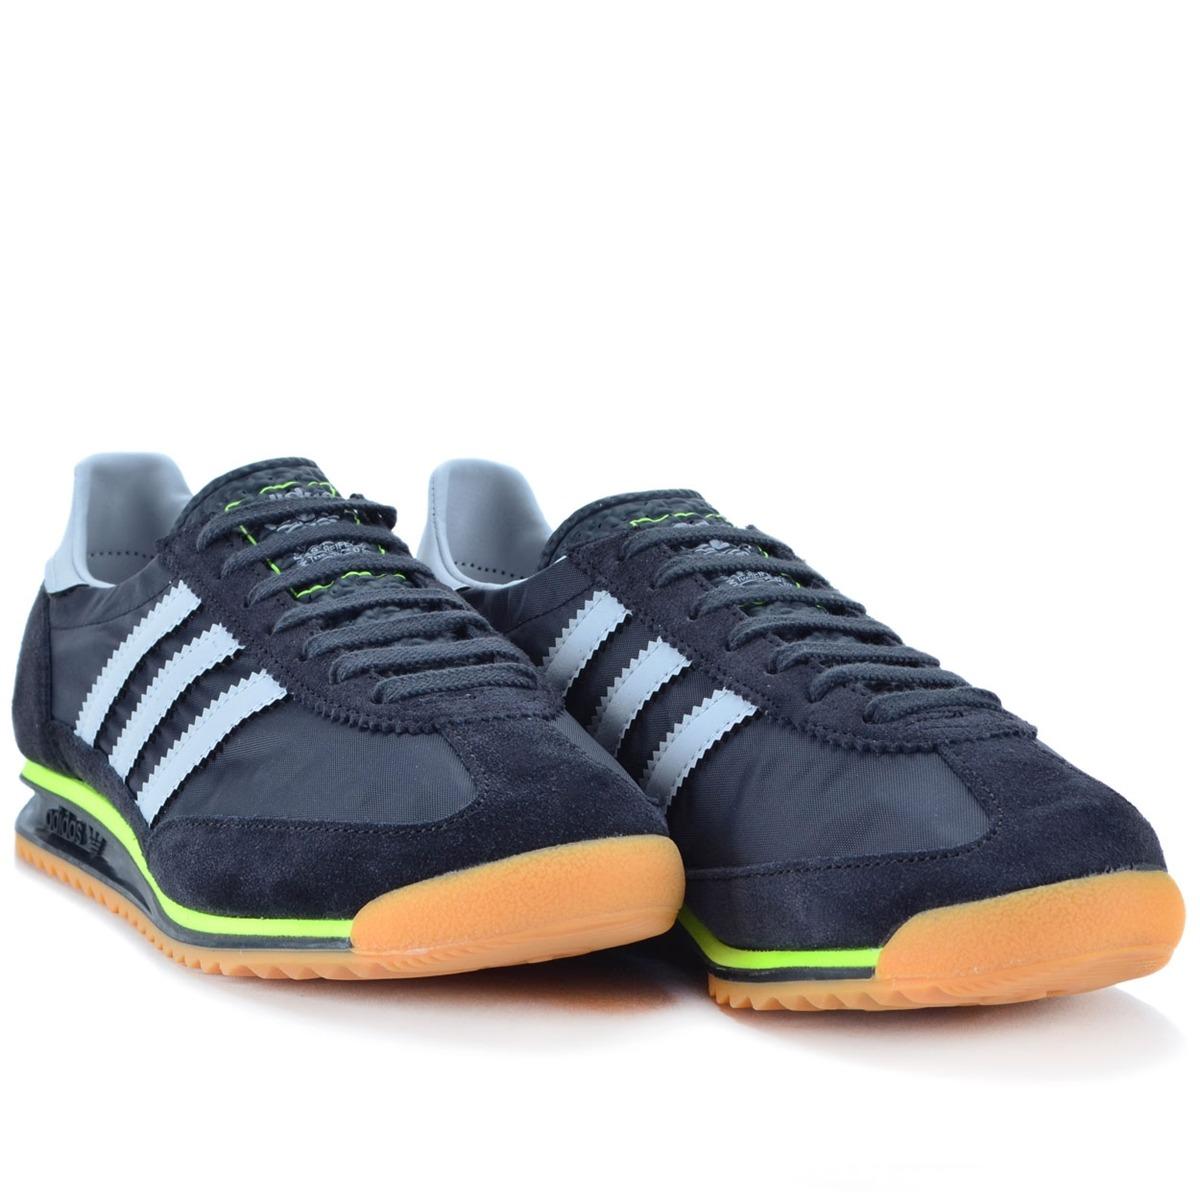 9688b8bbecb Tênis Adidas Originals Sl 72 W elconsejo.es